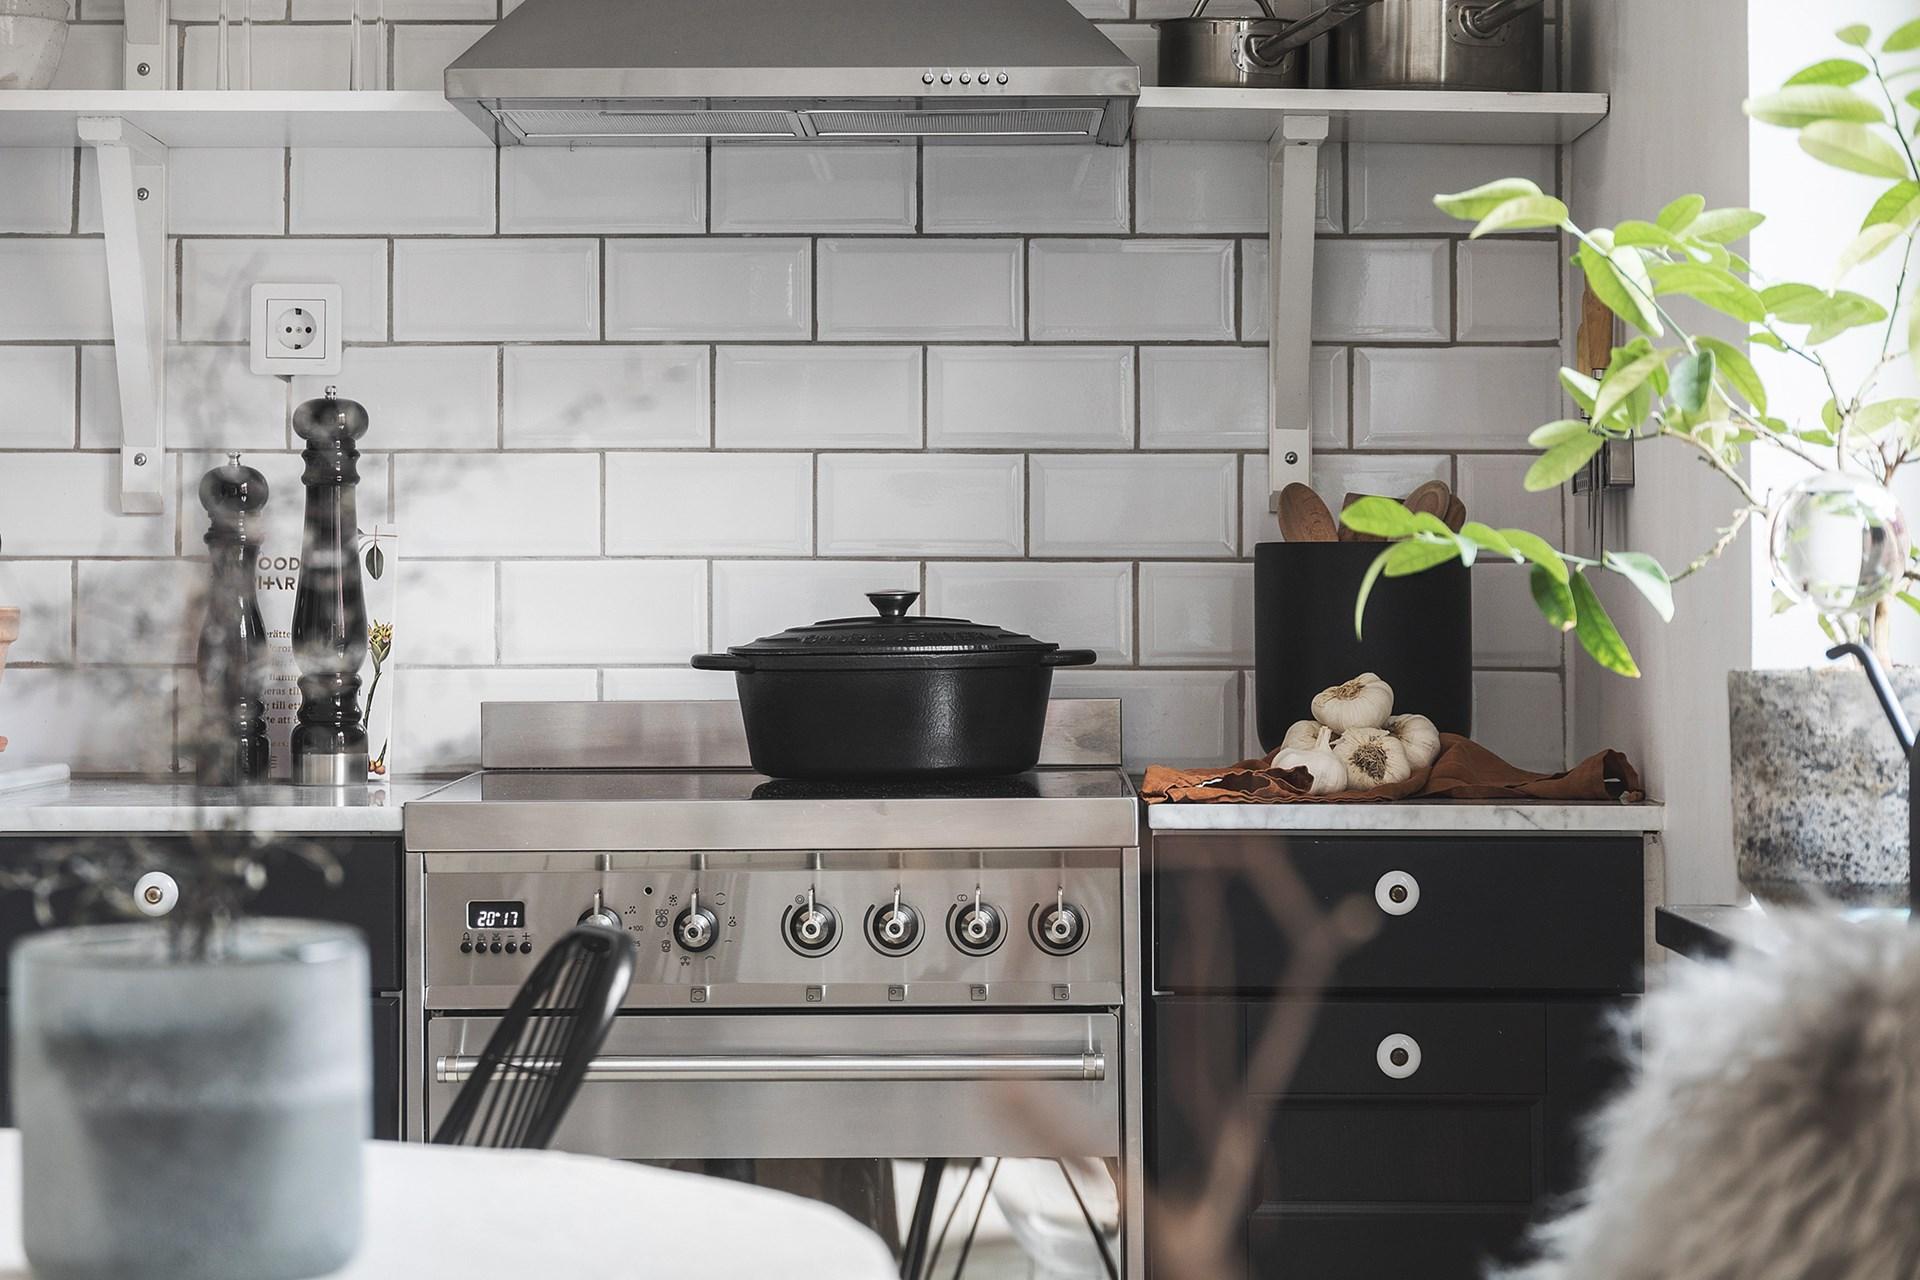 квартира 40 квм кухонная мебель плита